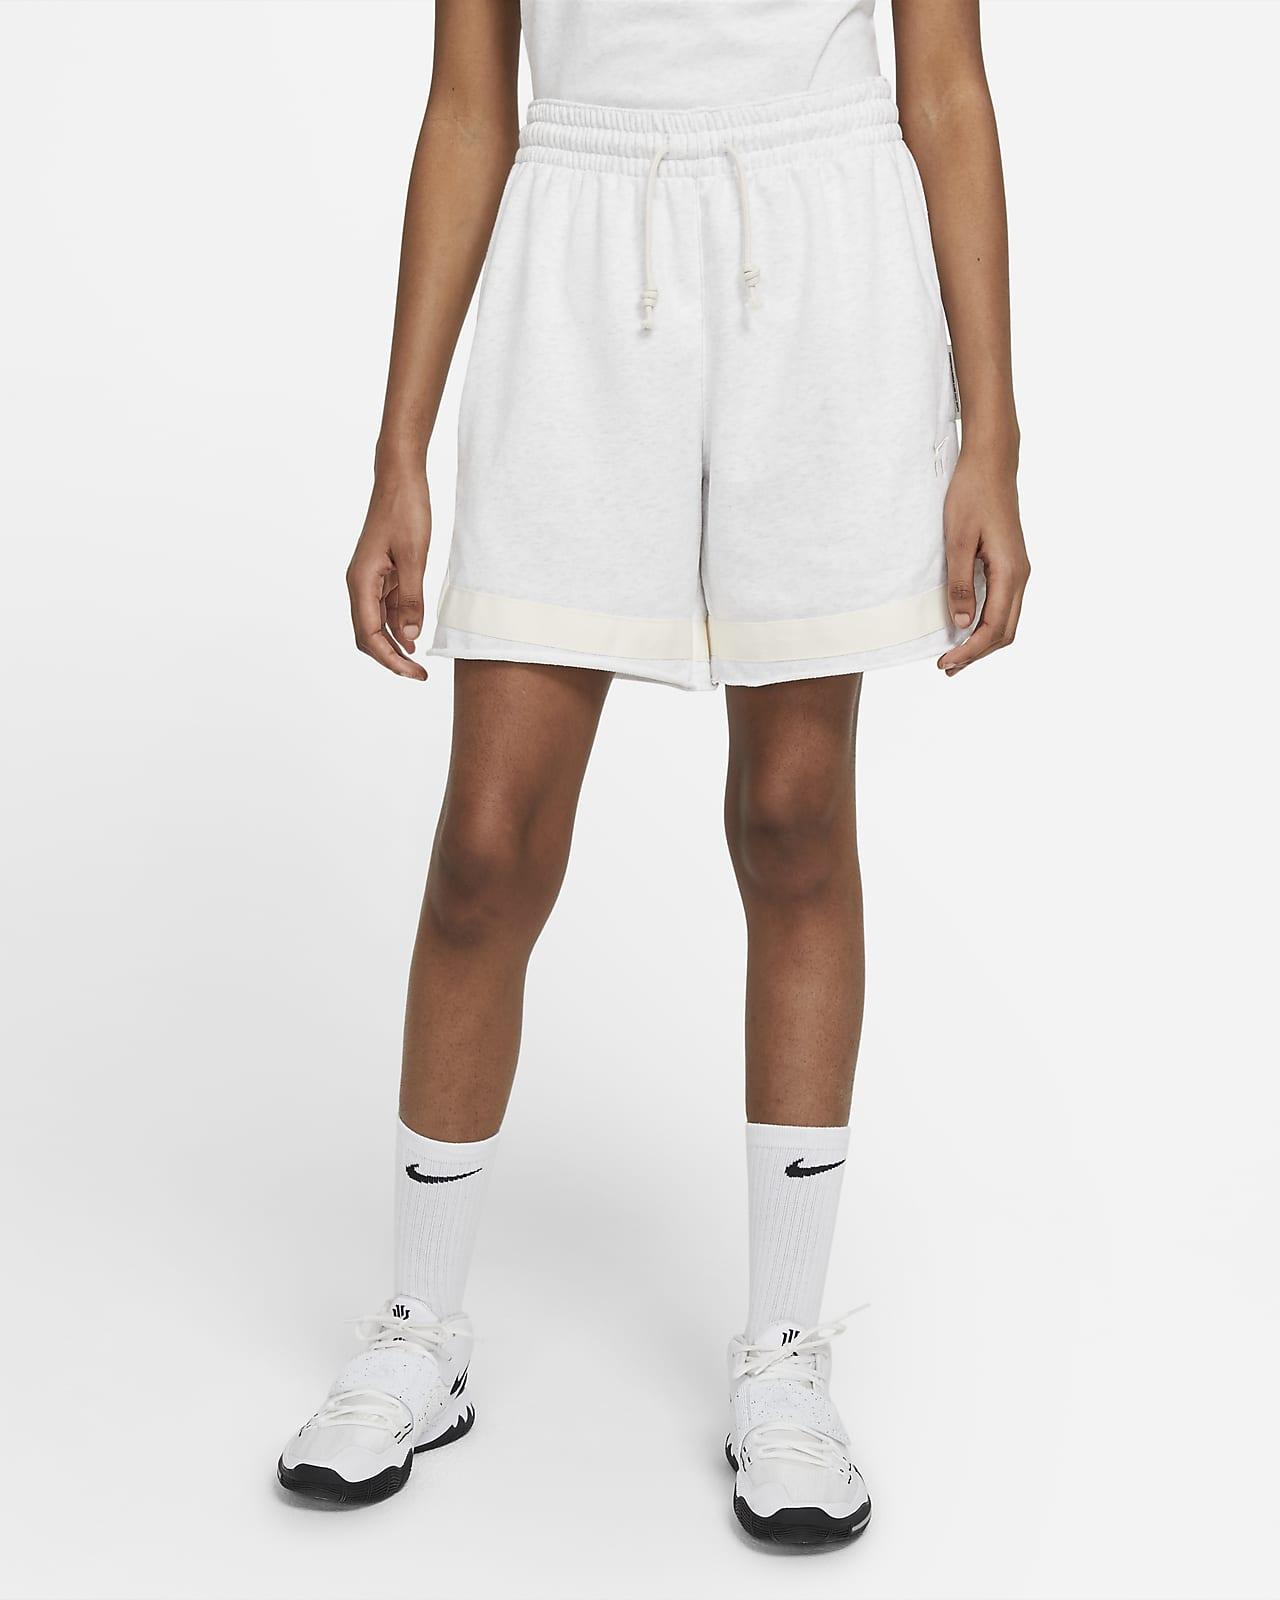 Shorts de básquetbol para mujer Nike Standard Issue Swoosh Fly